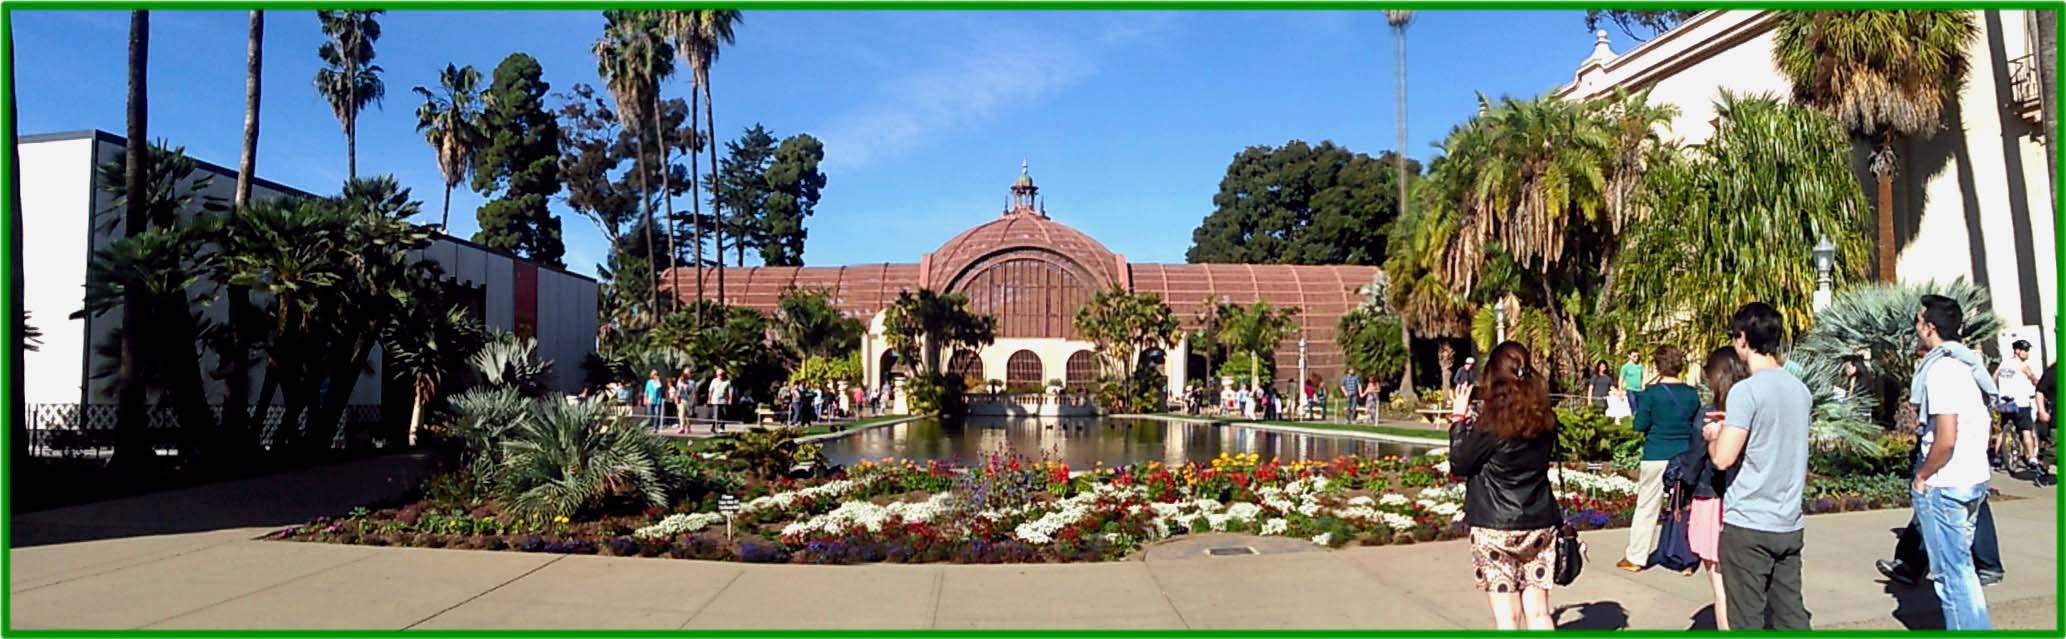 Superbe Balboa Park Botanical Garden And Pond